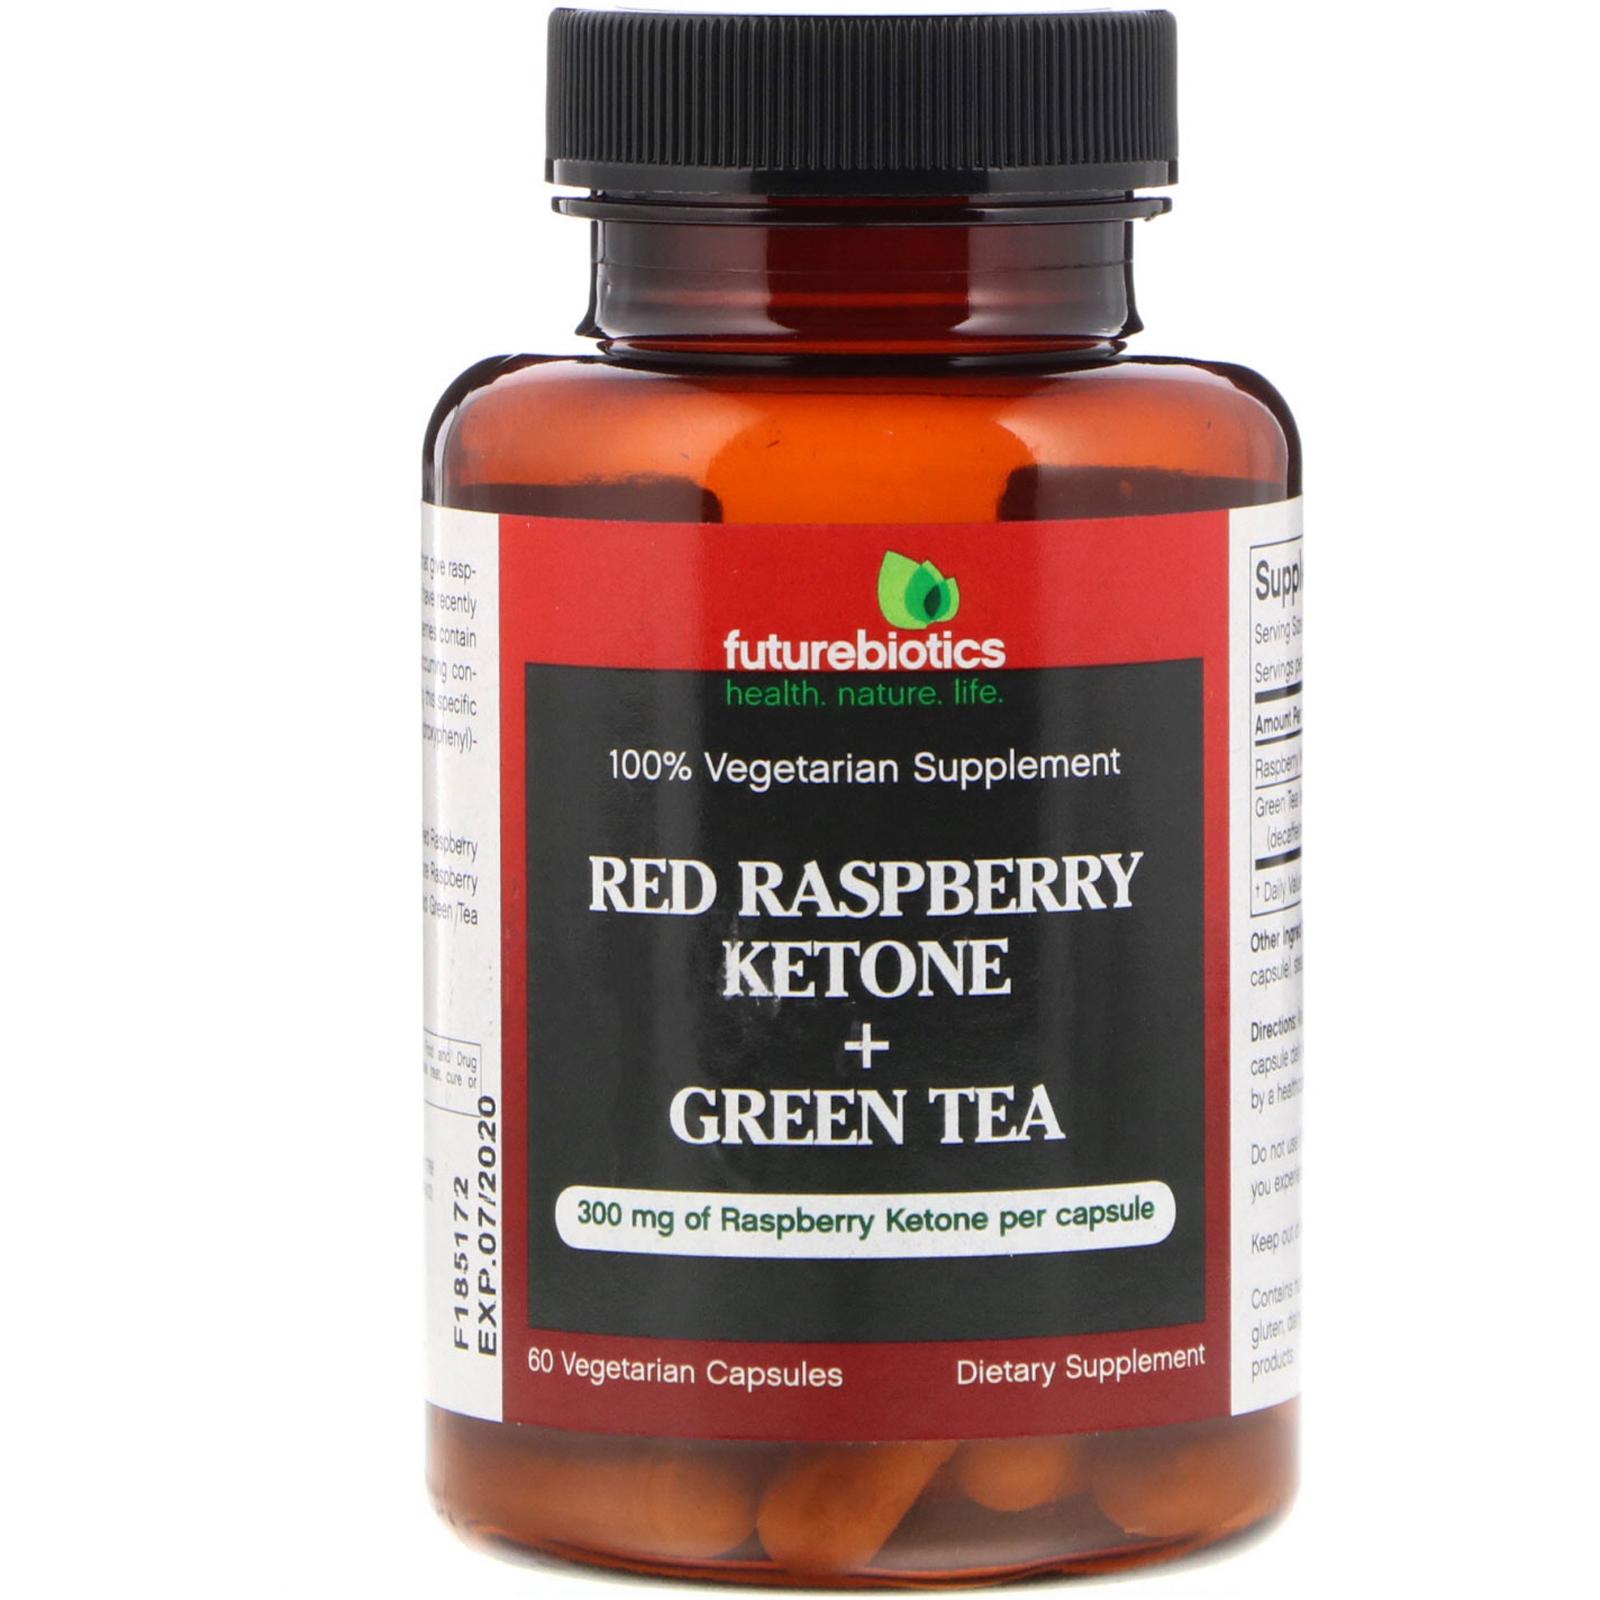 Futurebiotics Red Raspberry Ketone Green Tea 60 Vegetarian